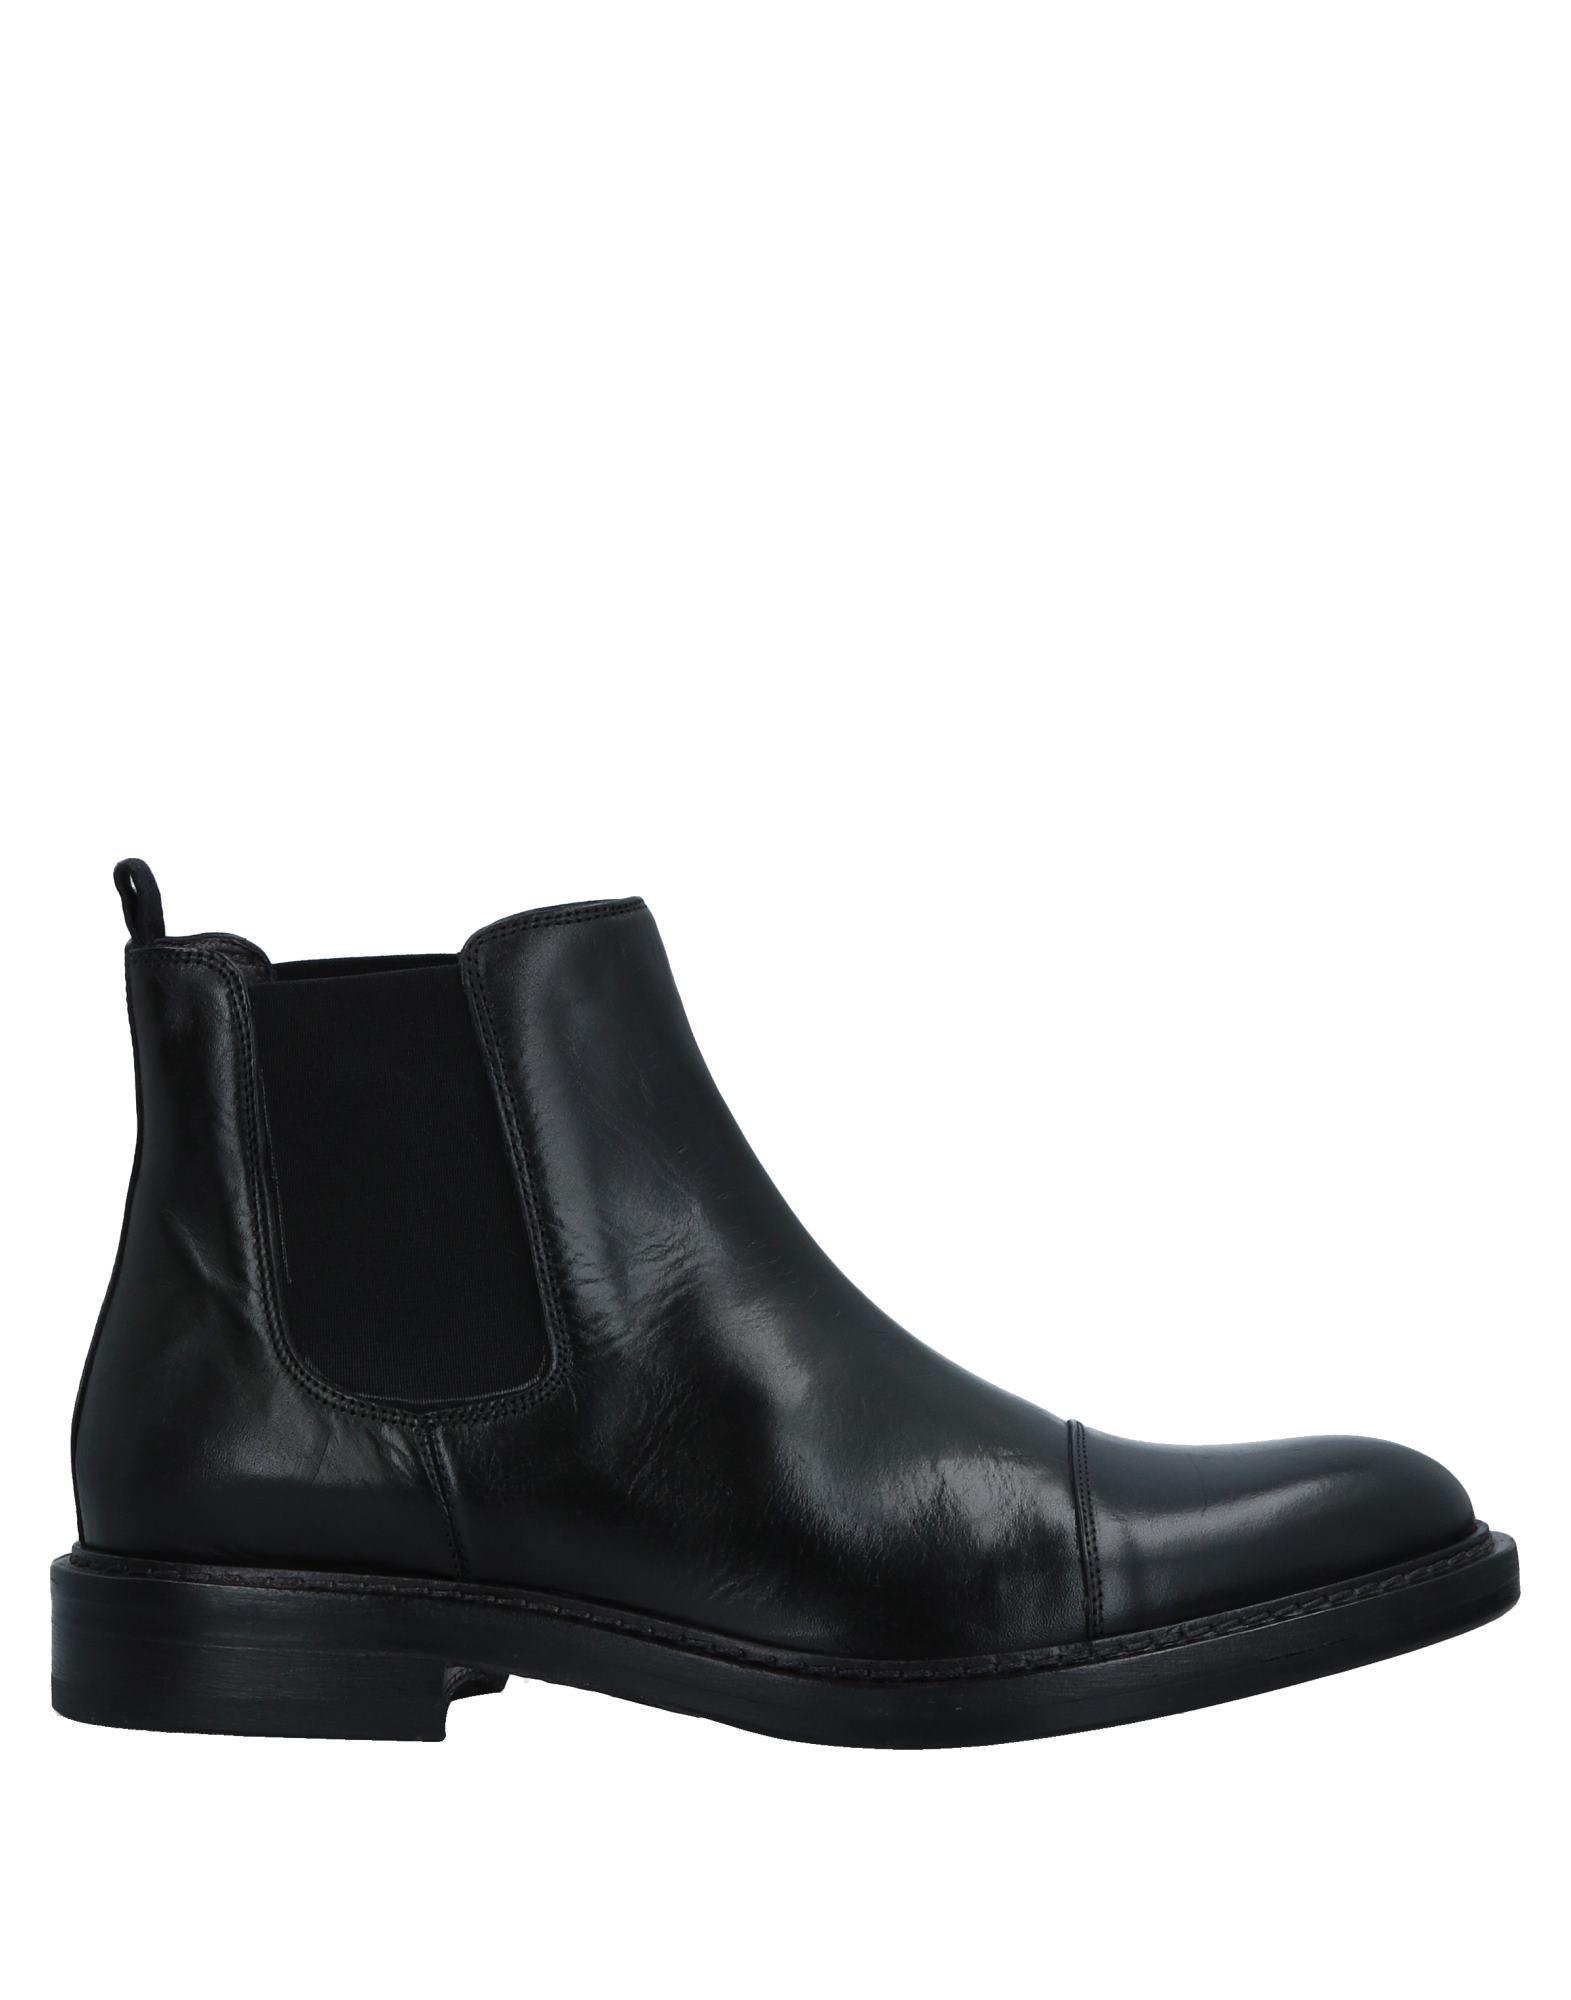 Hundred 100 Stiefelette Herren  11516508NG Gute Qualität beliebte Schuhe